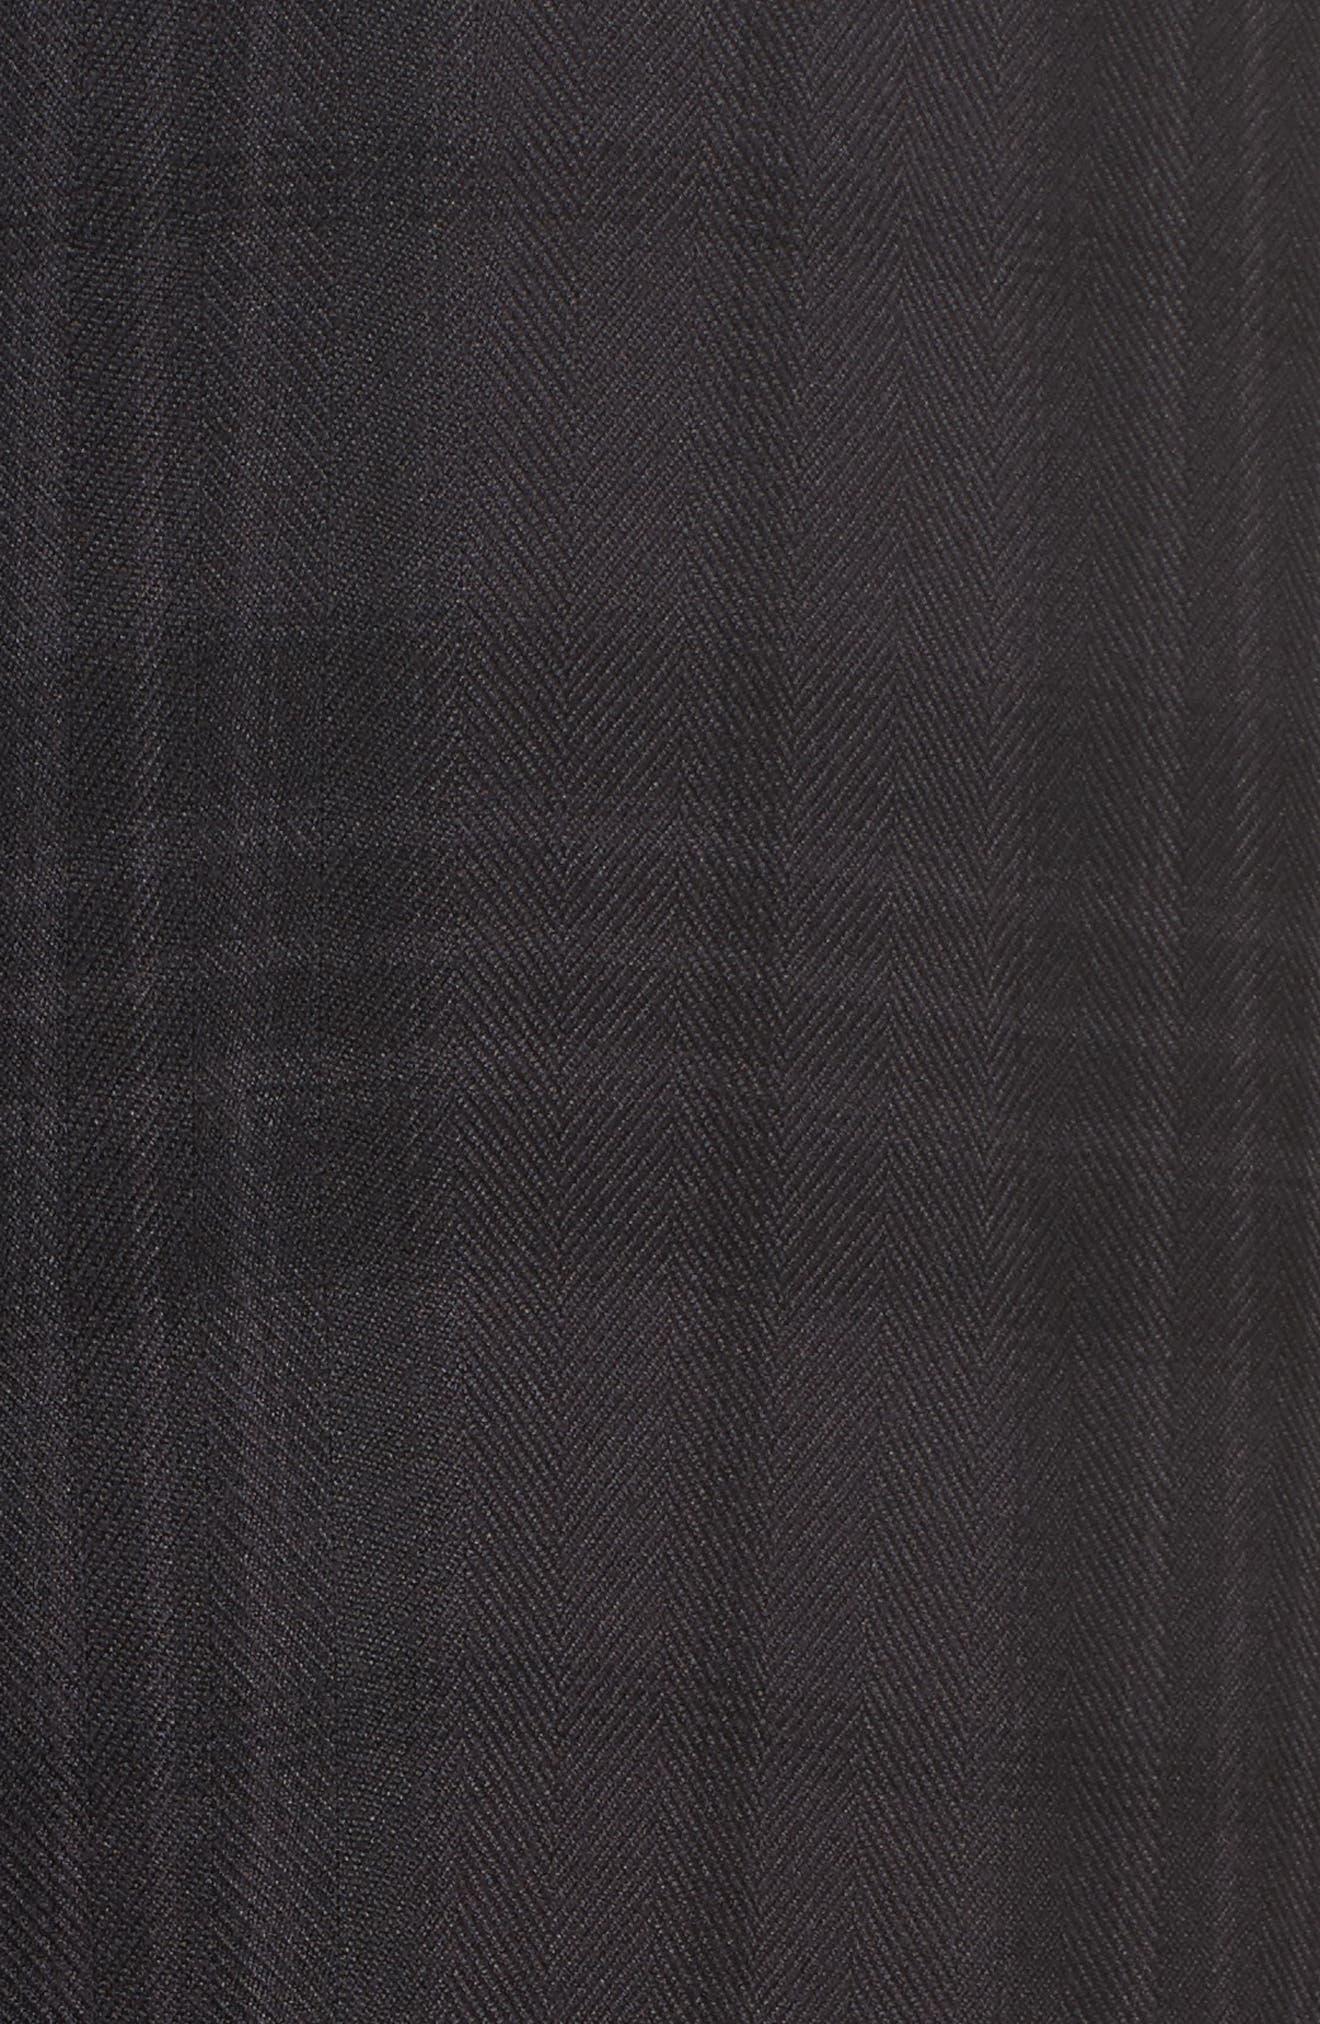 Plaid Pajamas,                             Alternate thumbnail 6, color,                             Onyx/ Jet